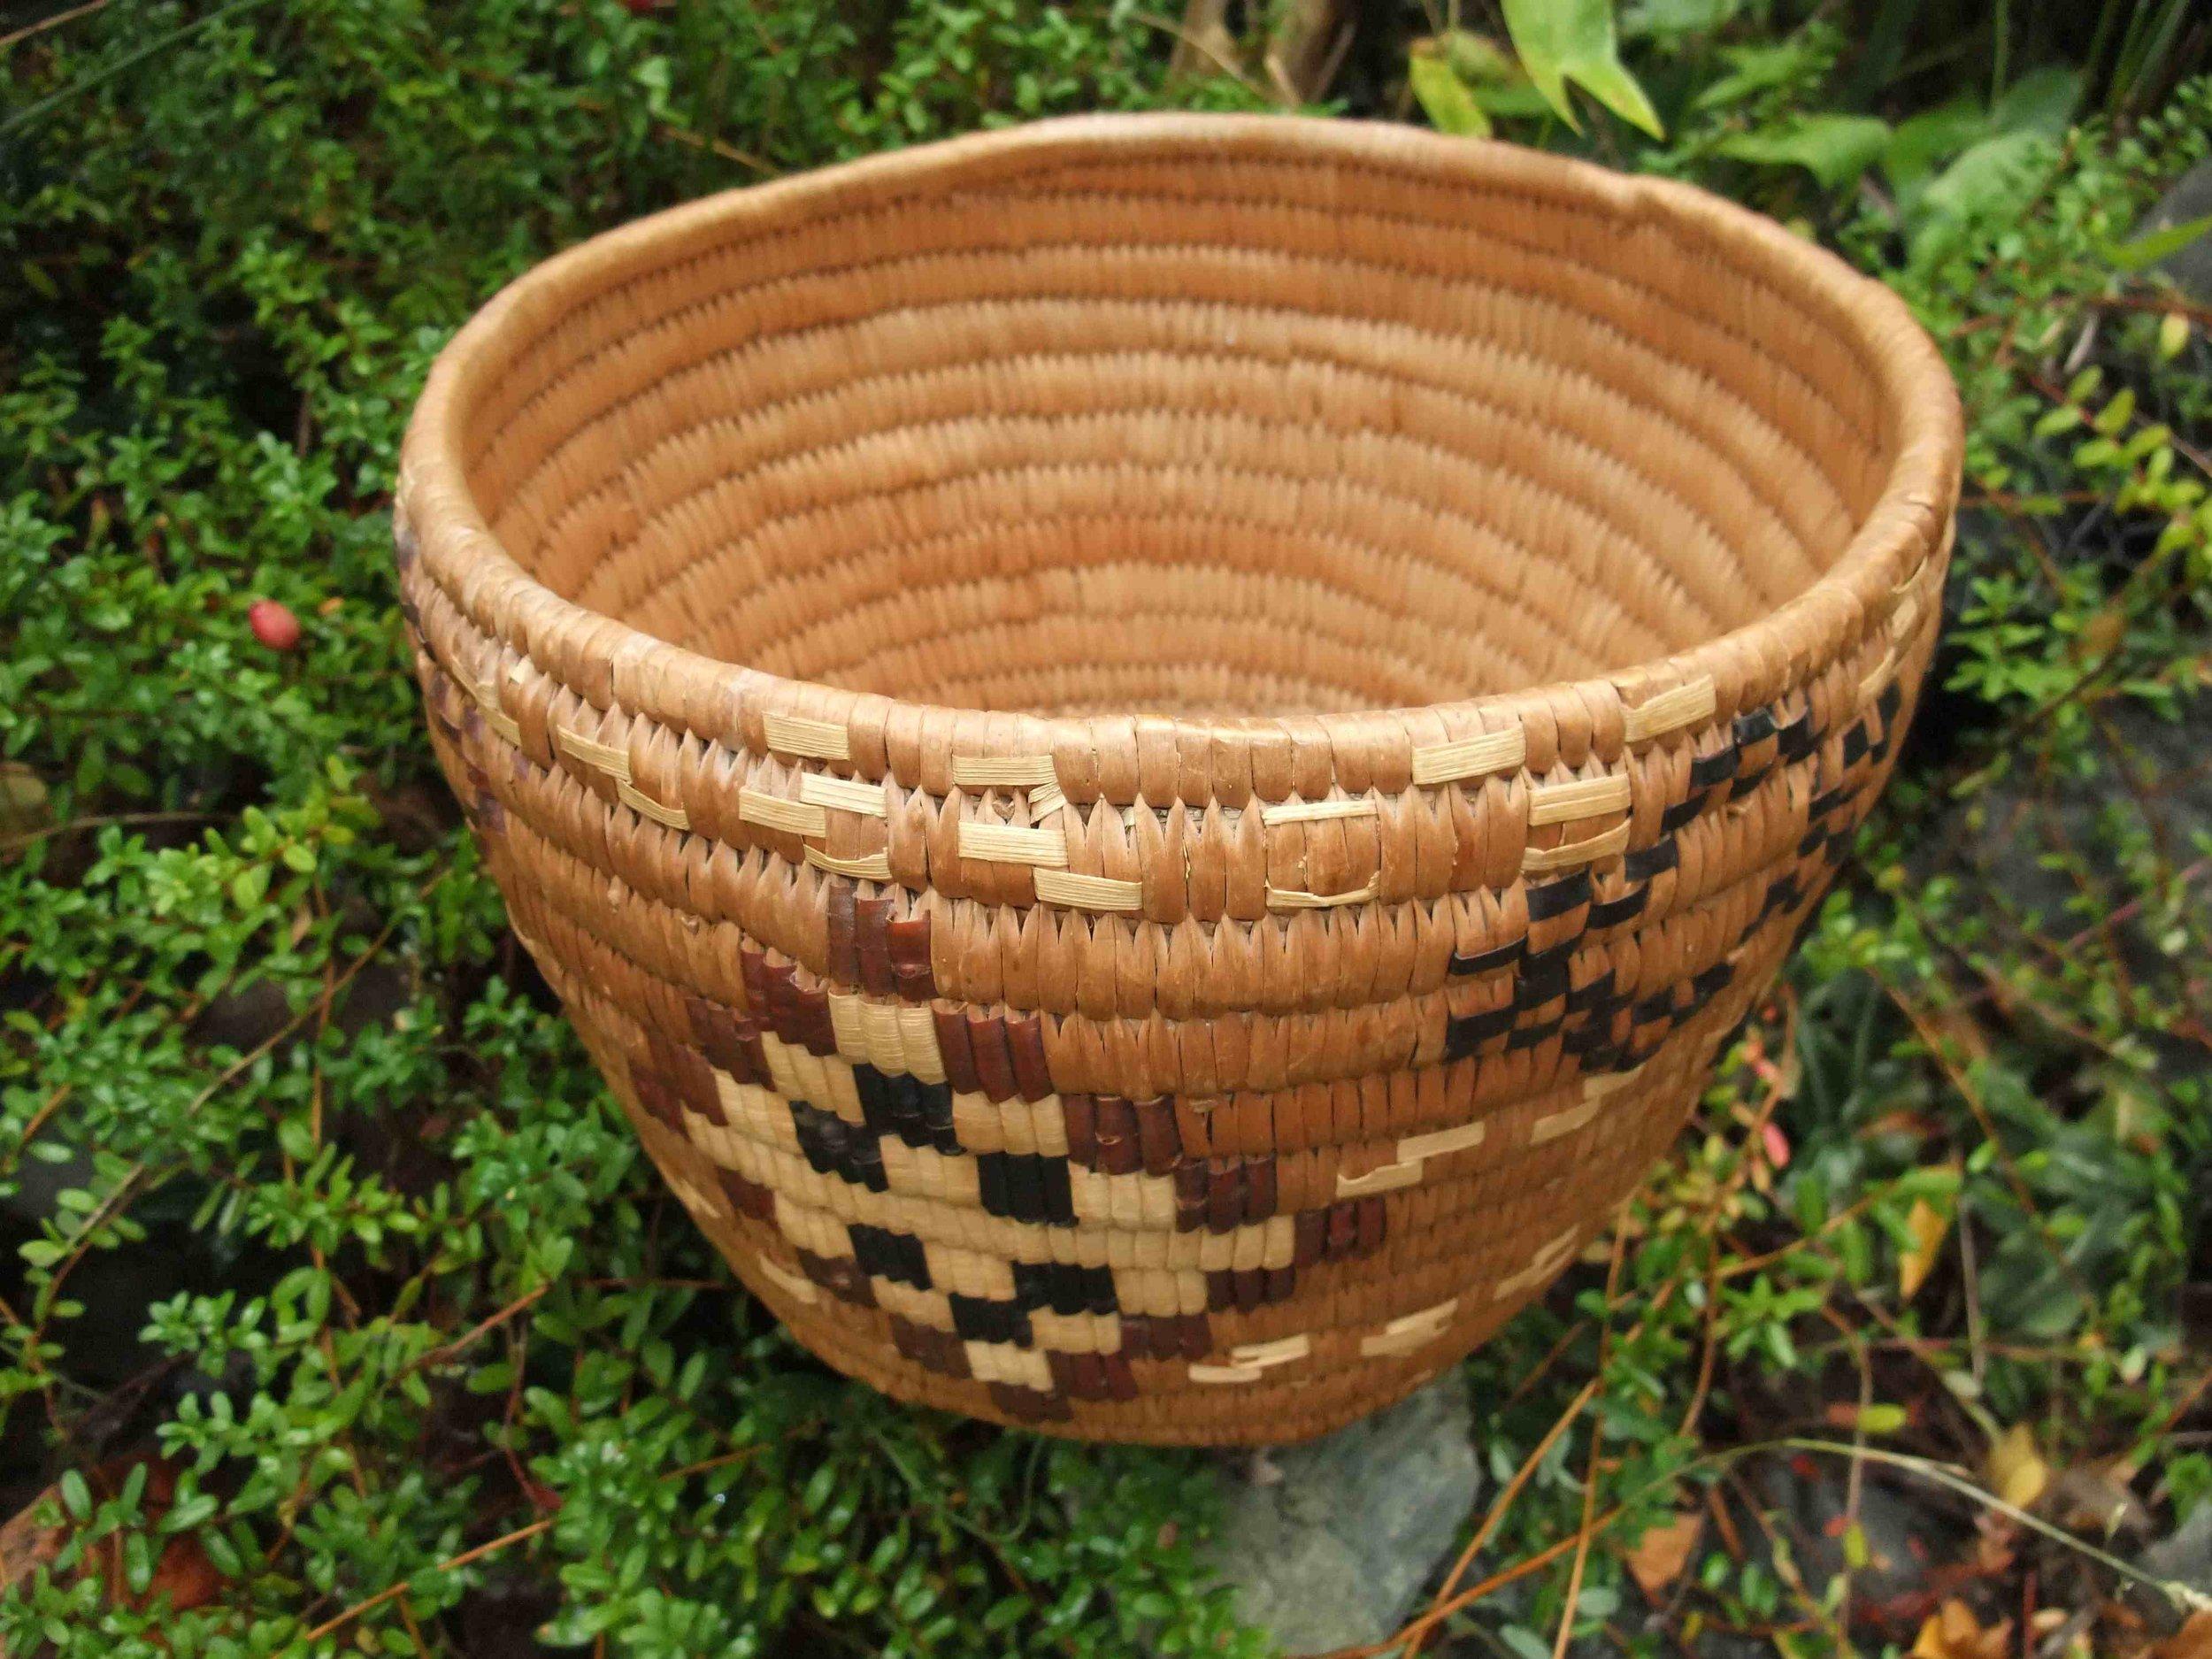 Coiled cedar root basket